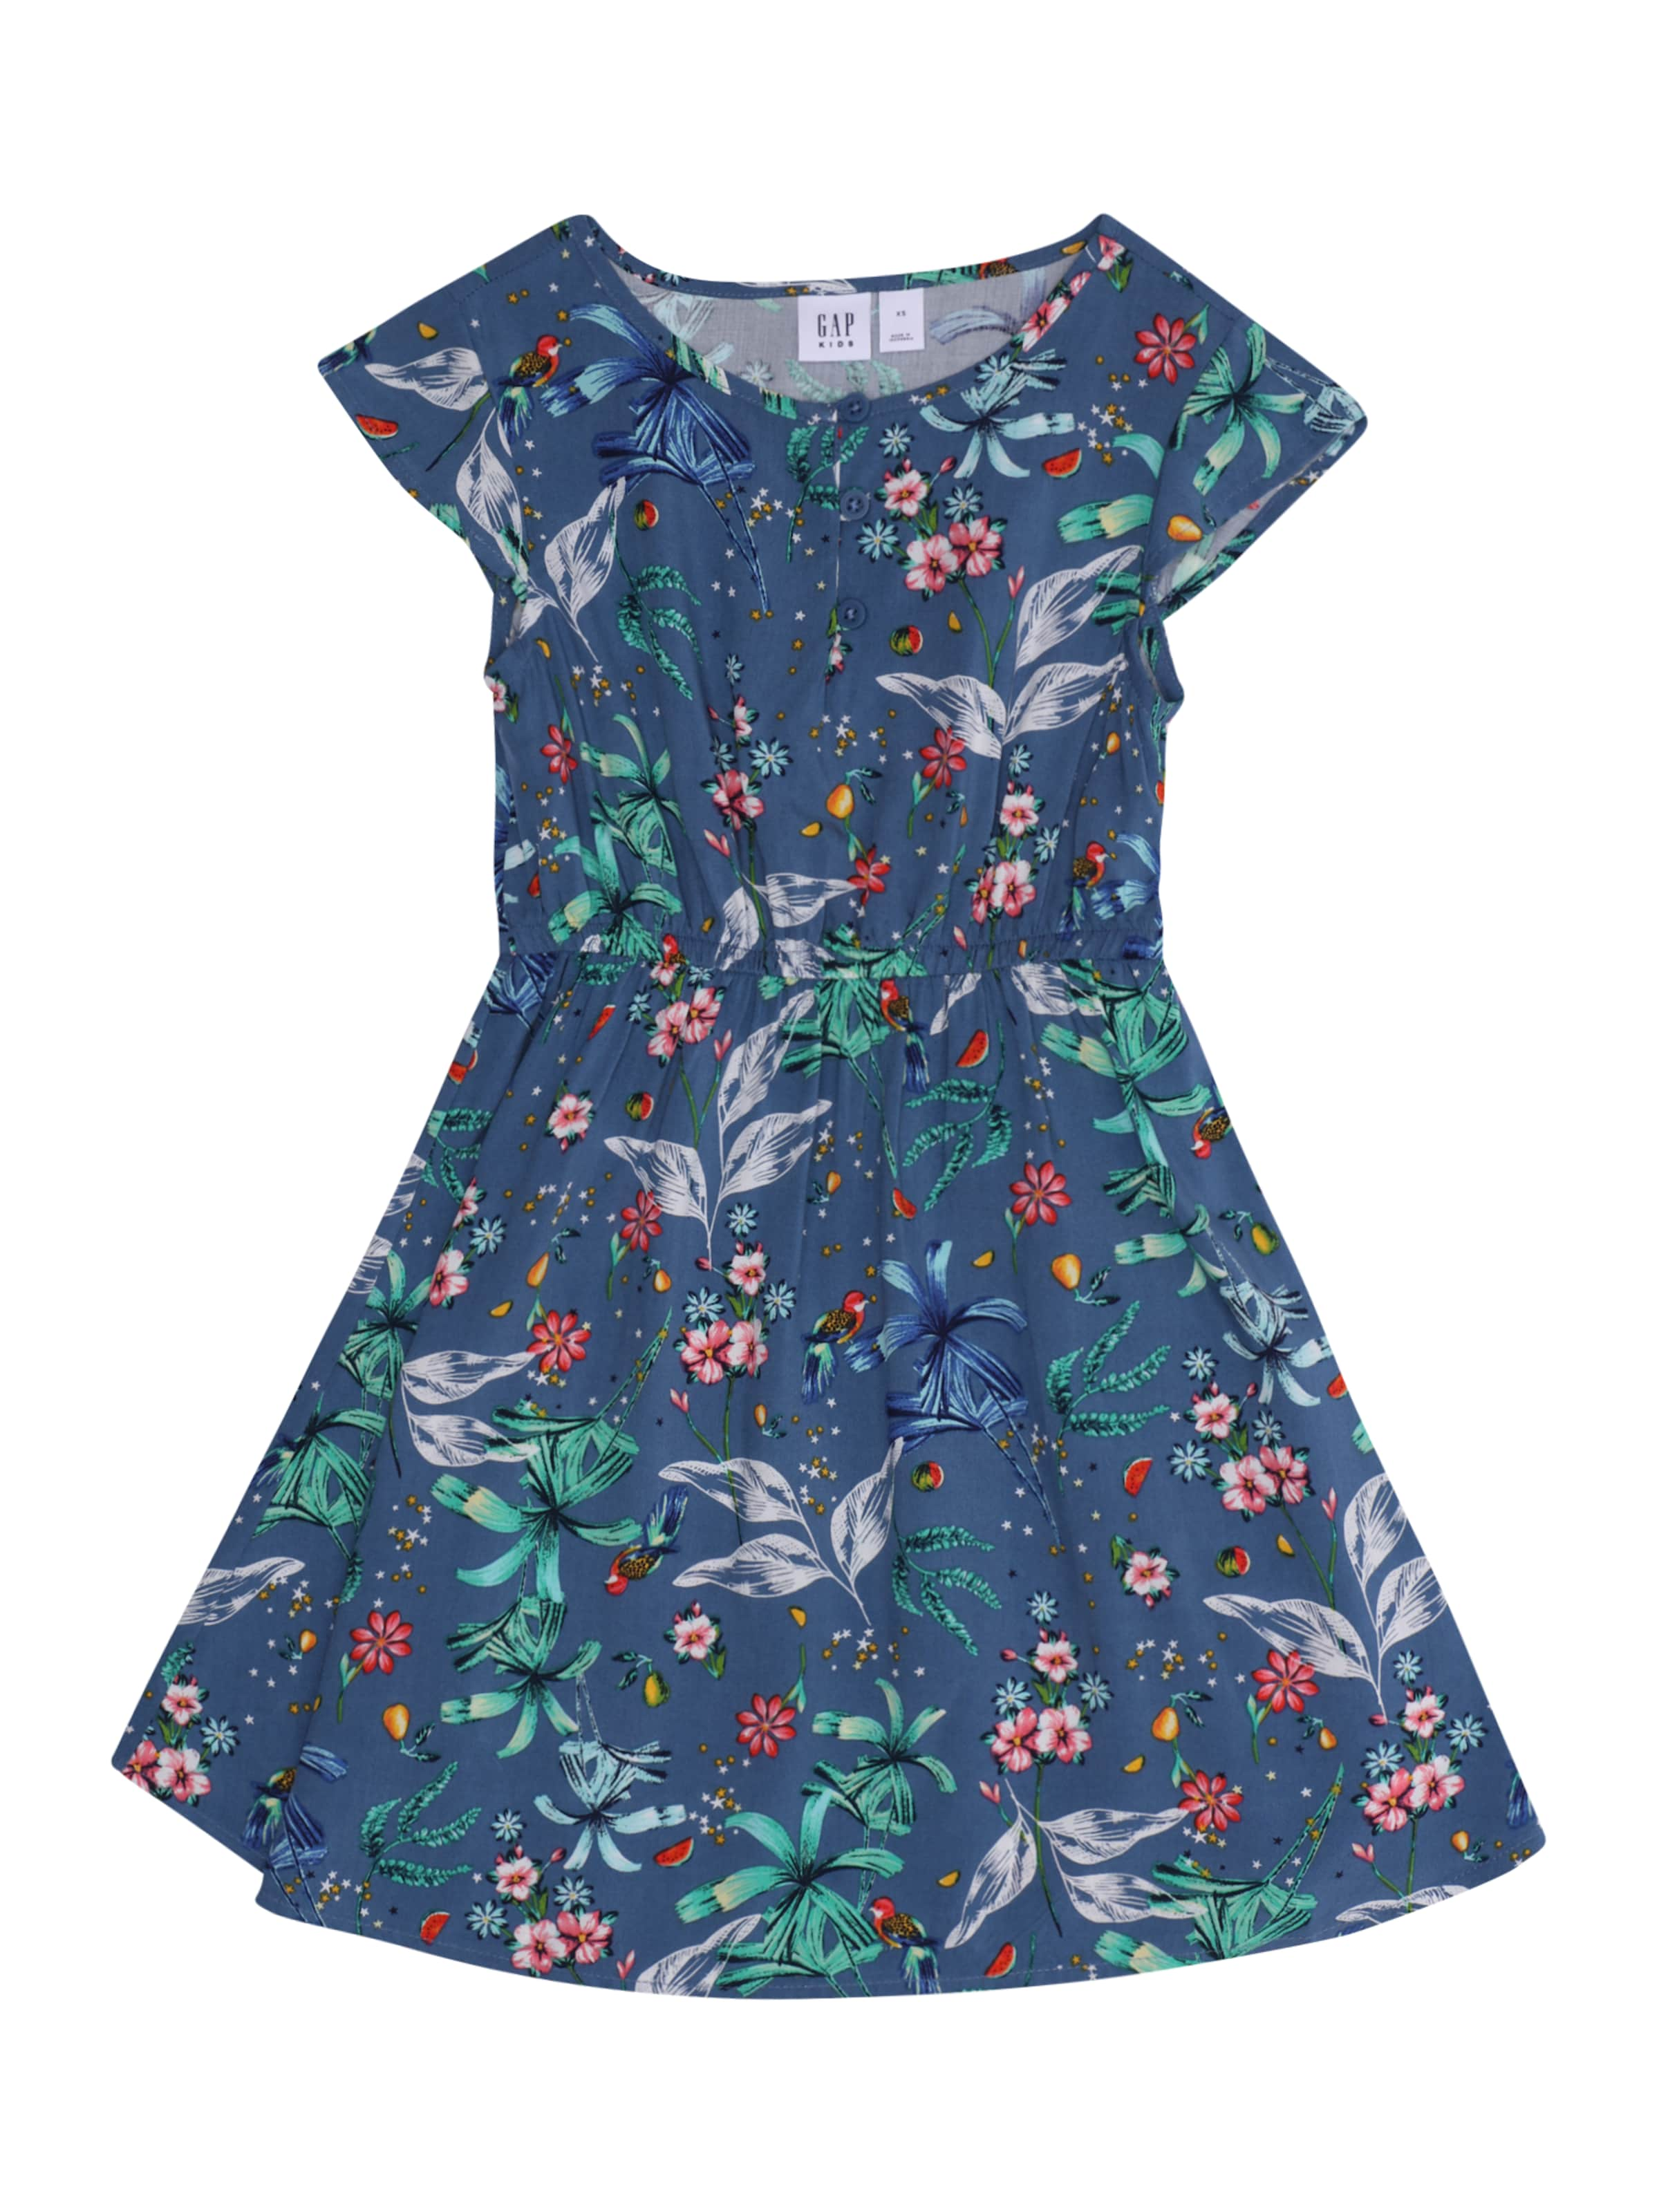 Kinder,  Mädchen,  Kinder GAP Sommerkleid blau | 00500027139092